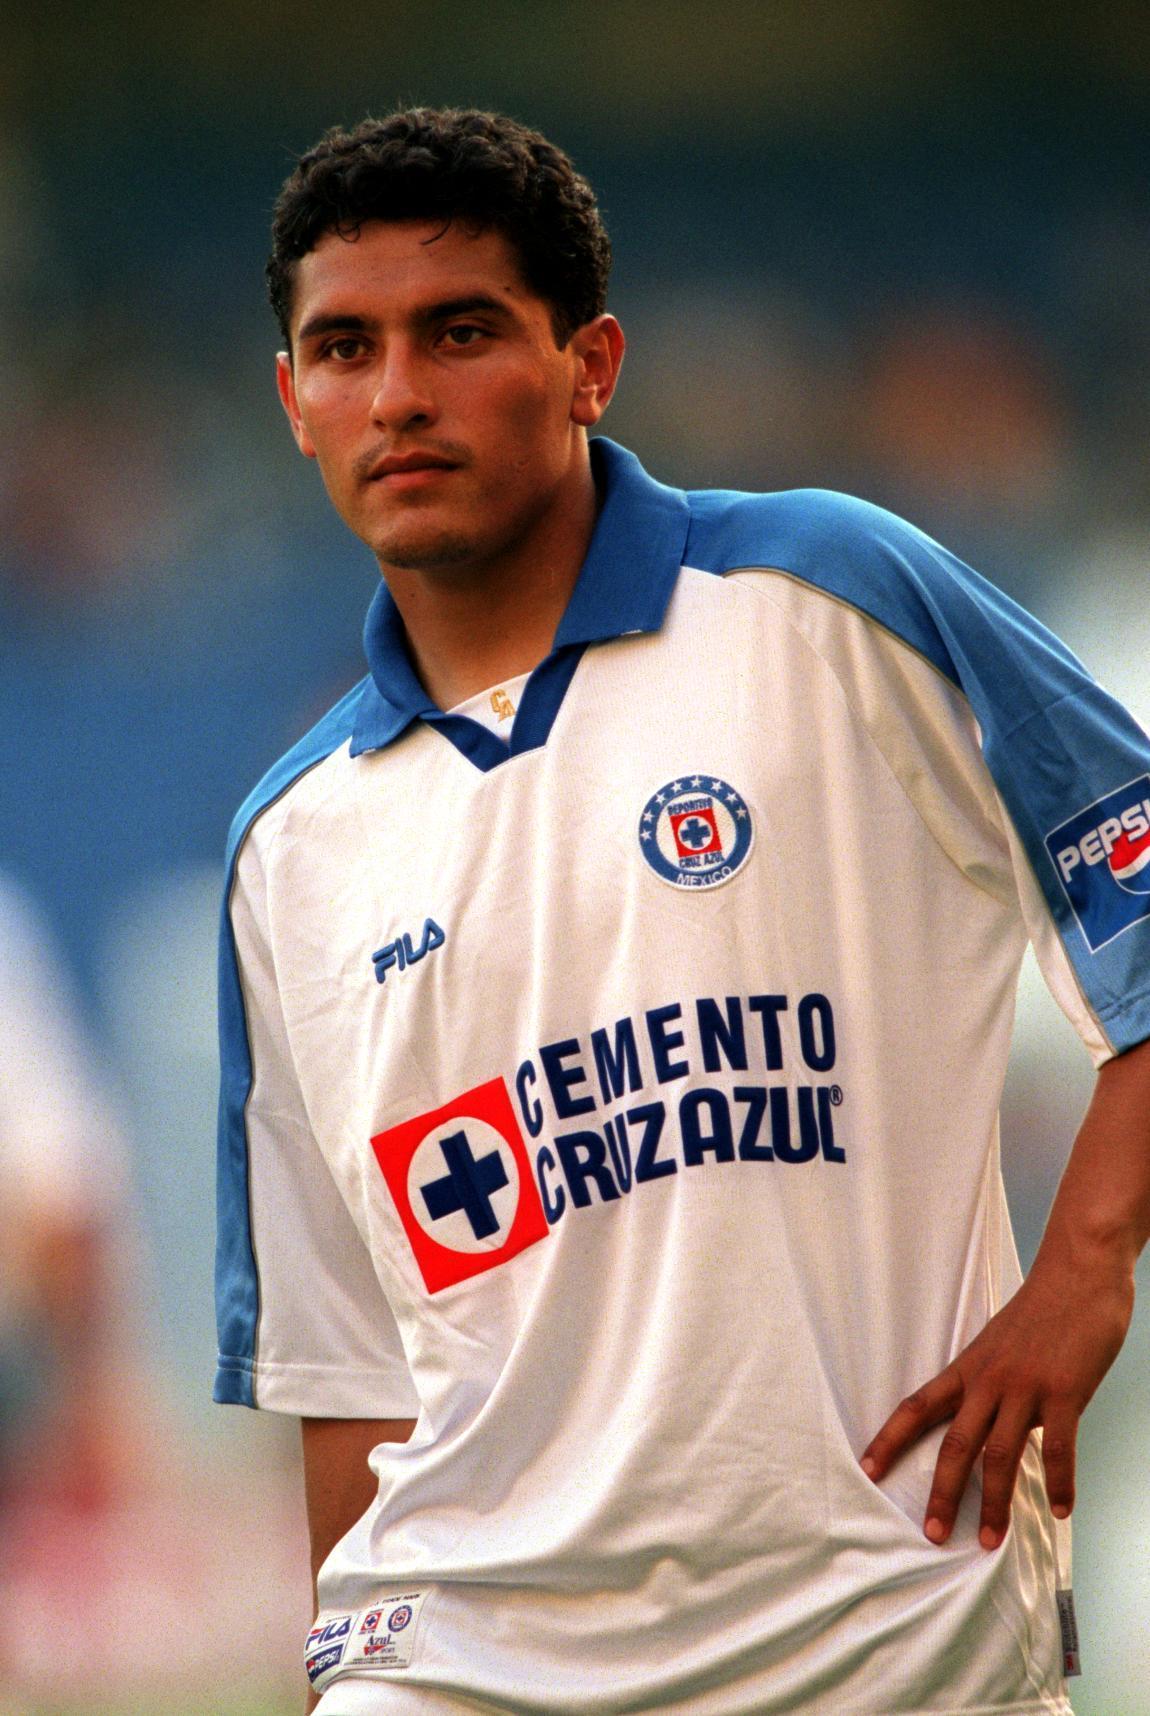 Soccer - Teresa Herrera Trophy - Cruz Azul v Penarol